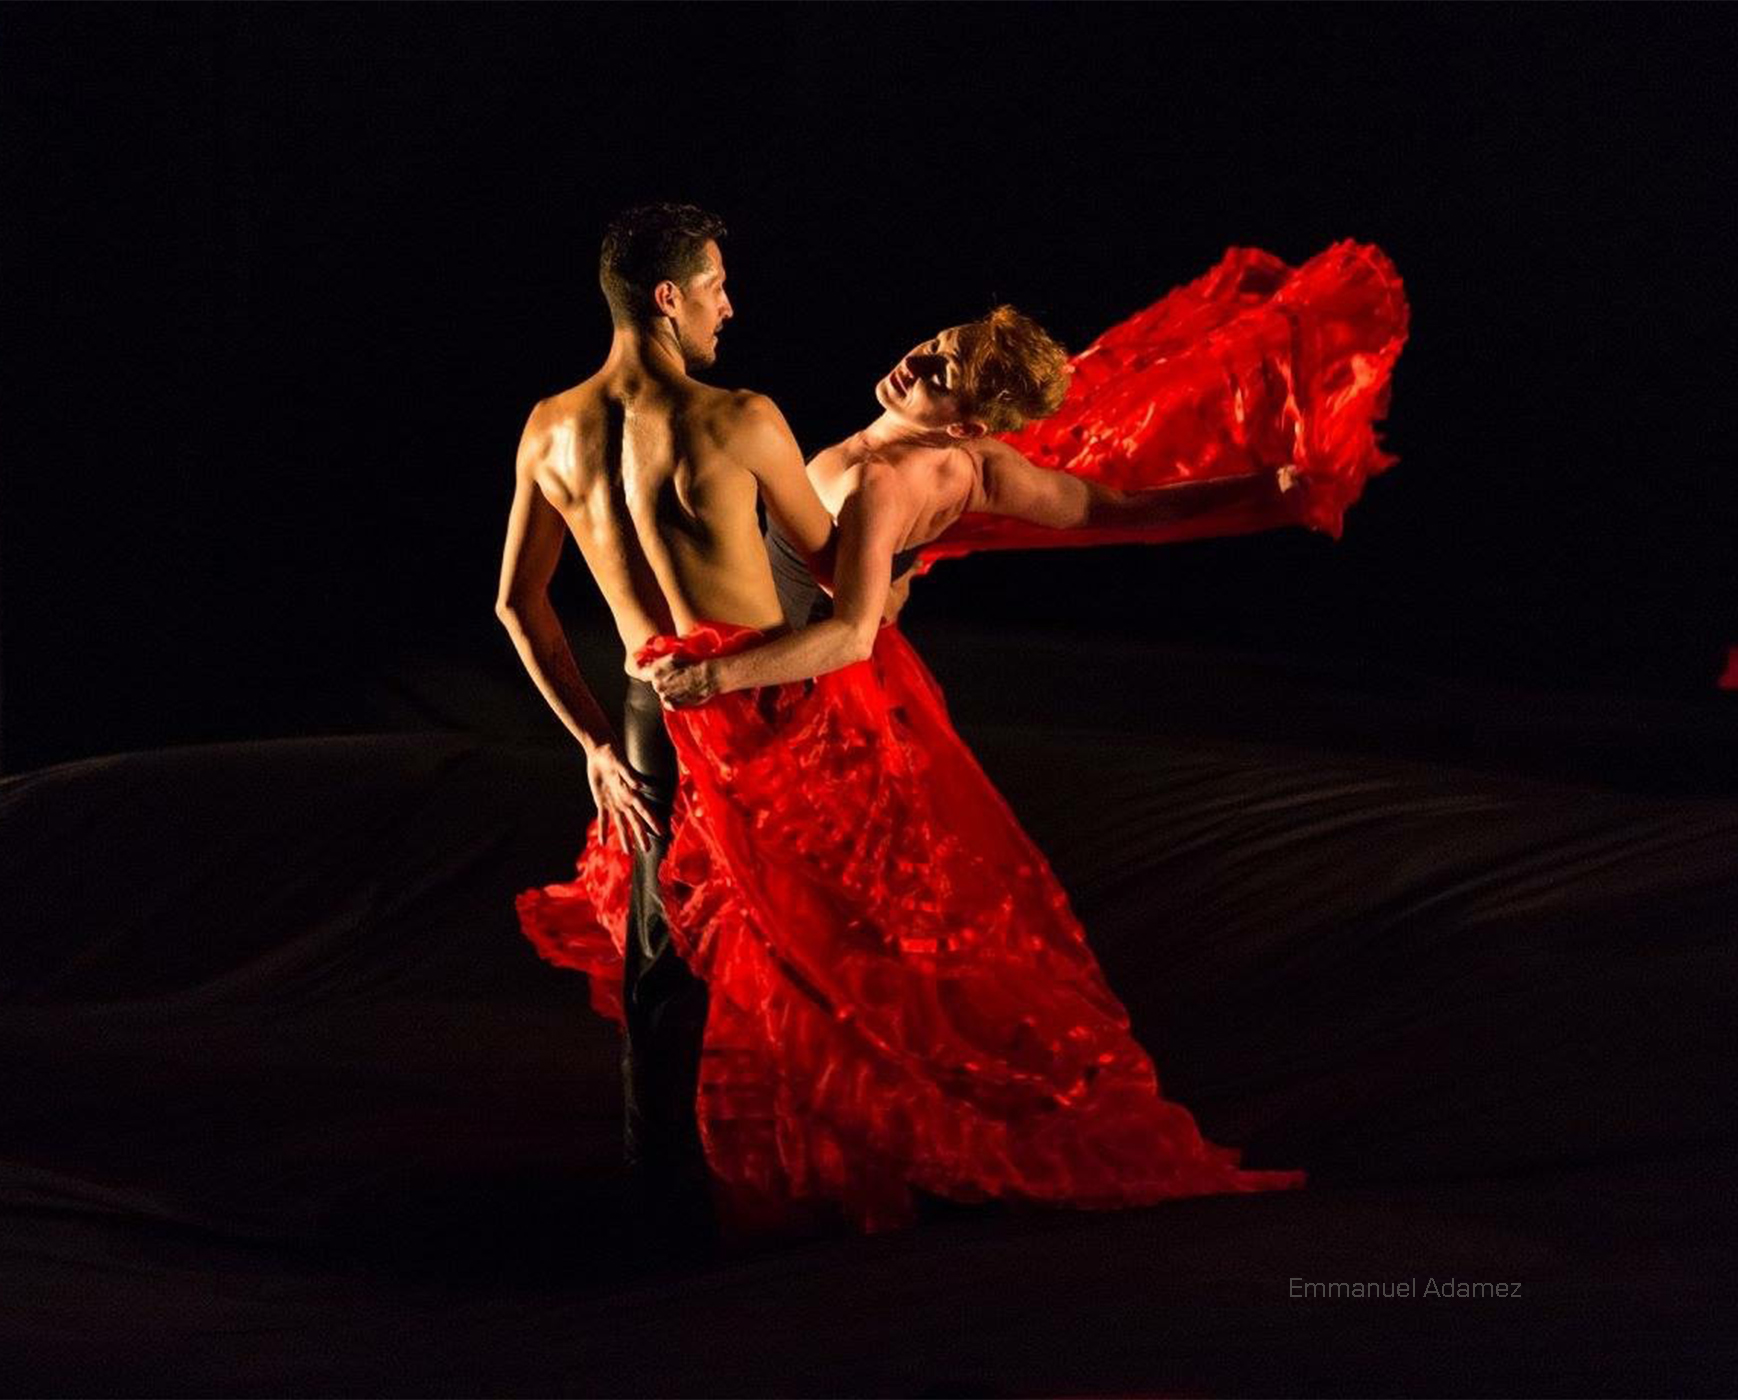 Red Dress Betto Emmanuel Adamez.jpg